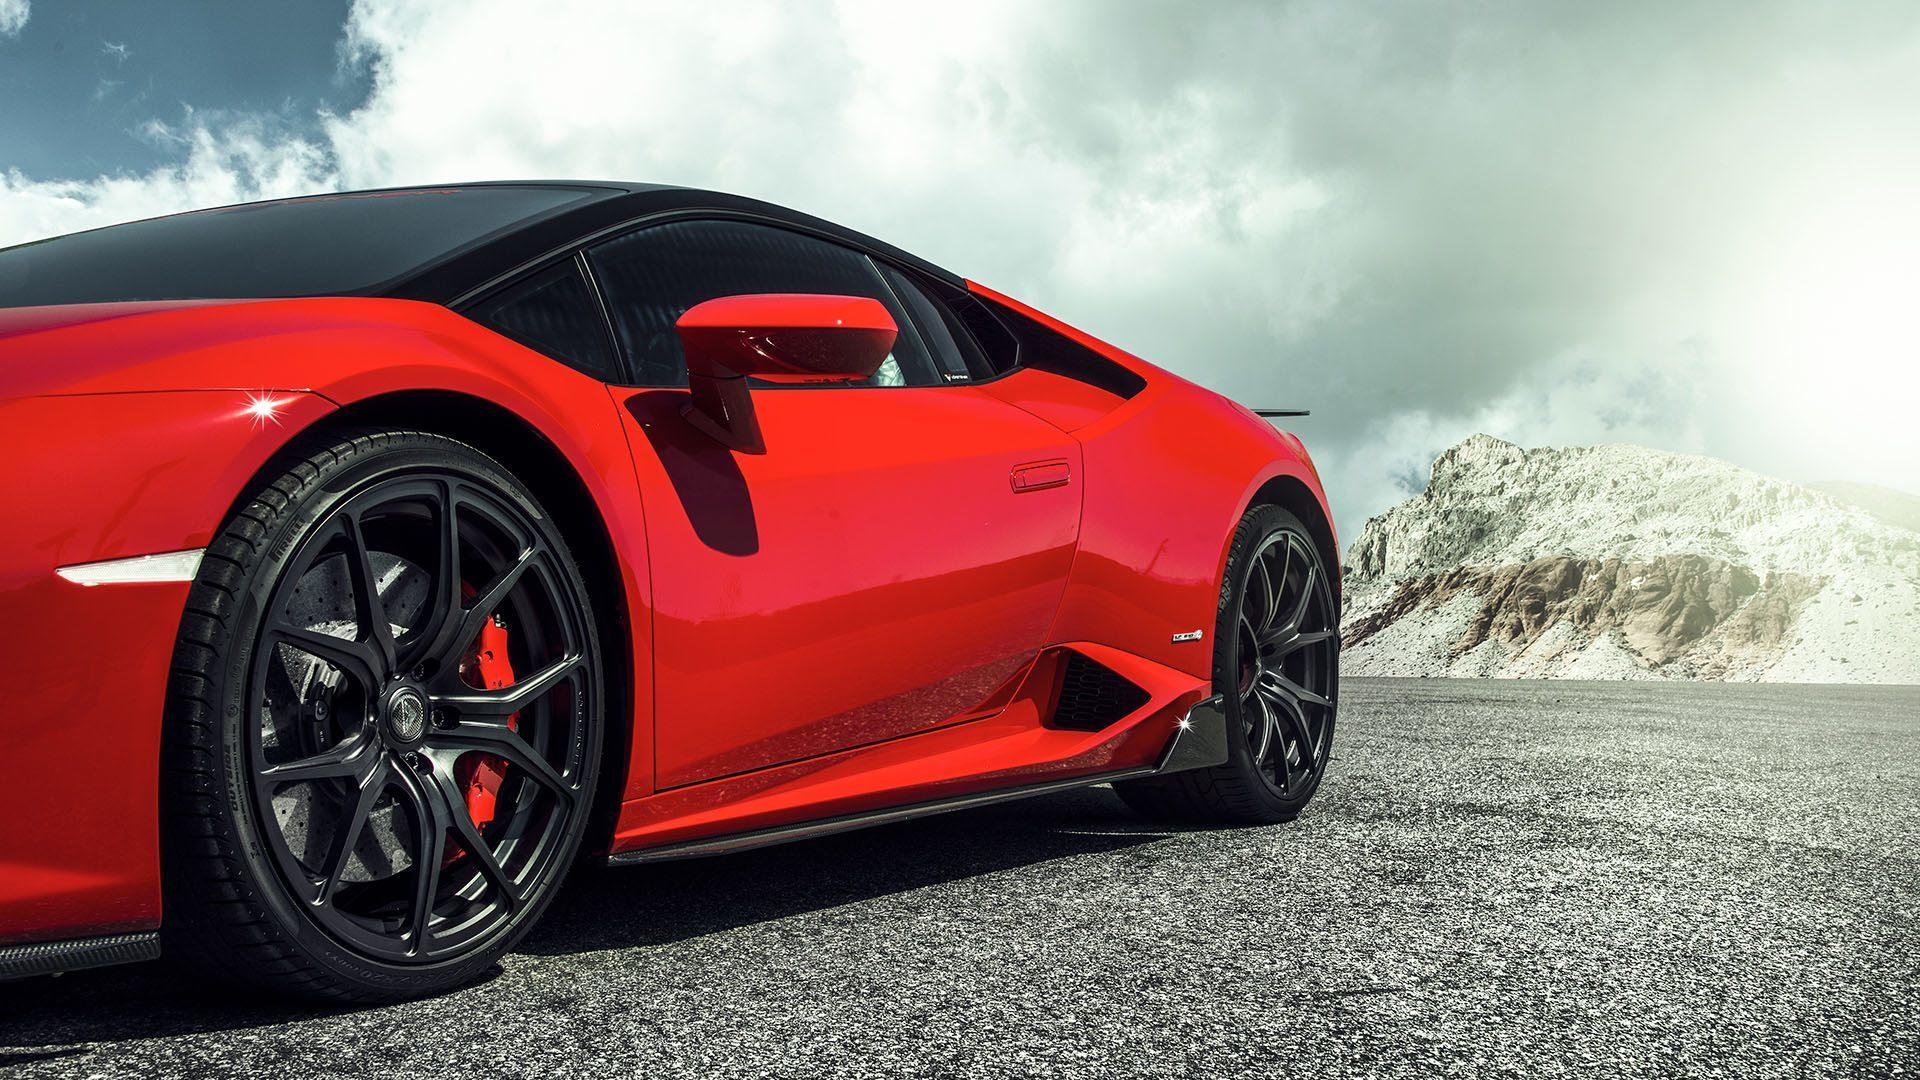 Карбоновые накладки под пороги Vorsteiner Style для Lamborghini Huracan